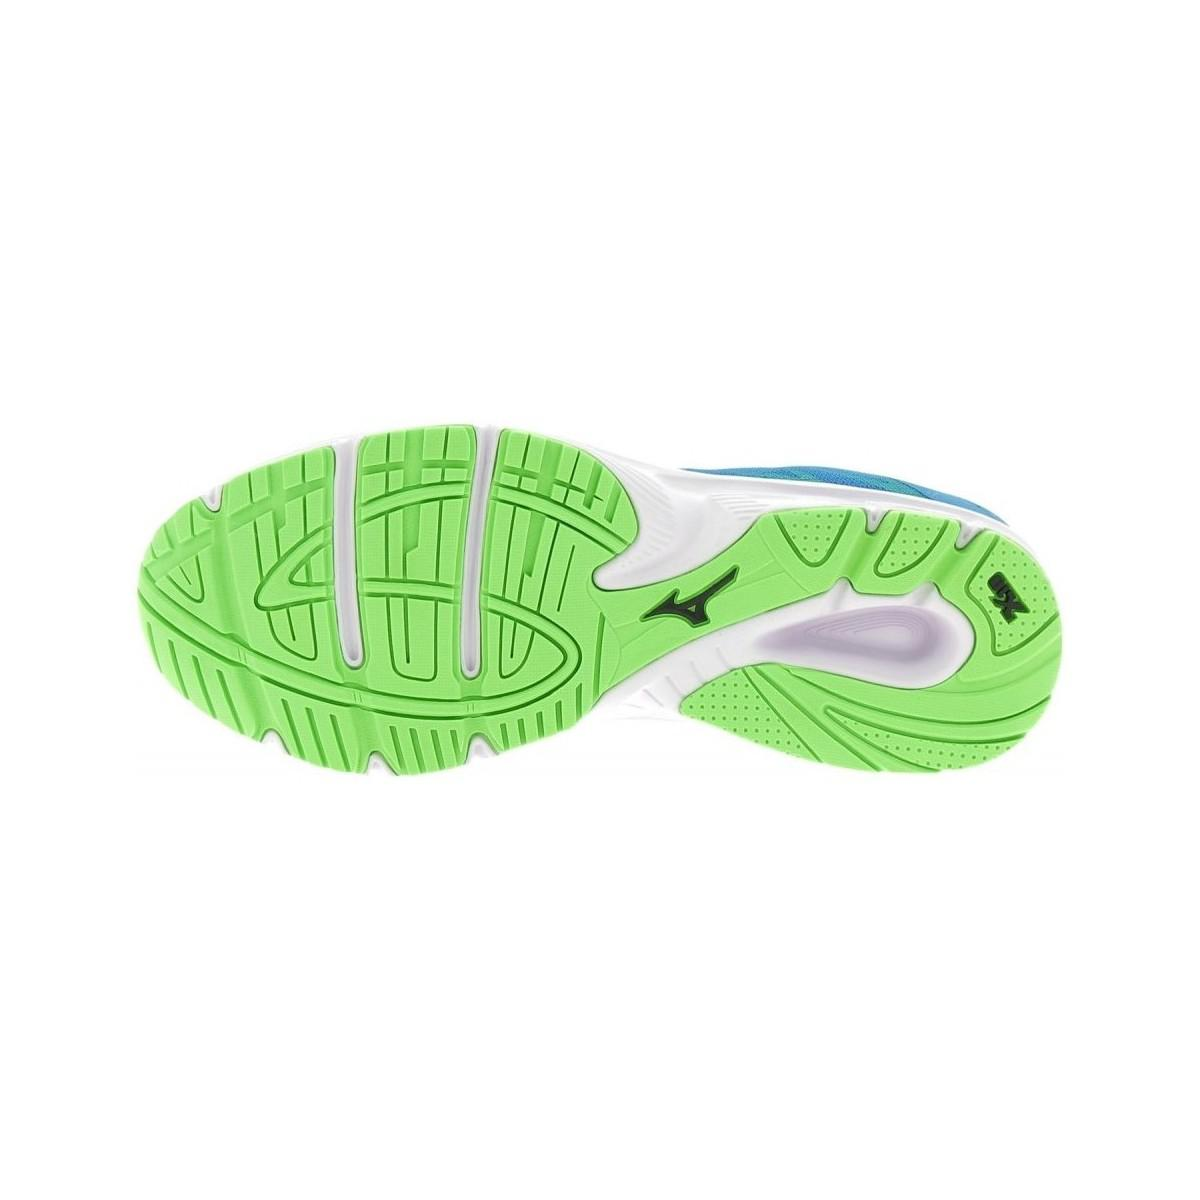 Mizuno Ezrun gris bleu blanc rouge Femmes Running Training Chaussure Sneaker J1GF1838-07